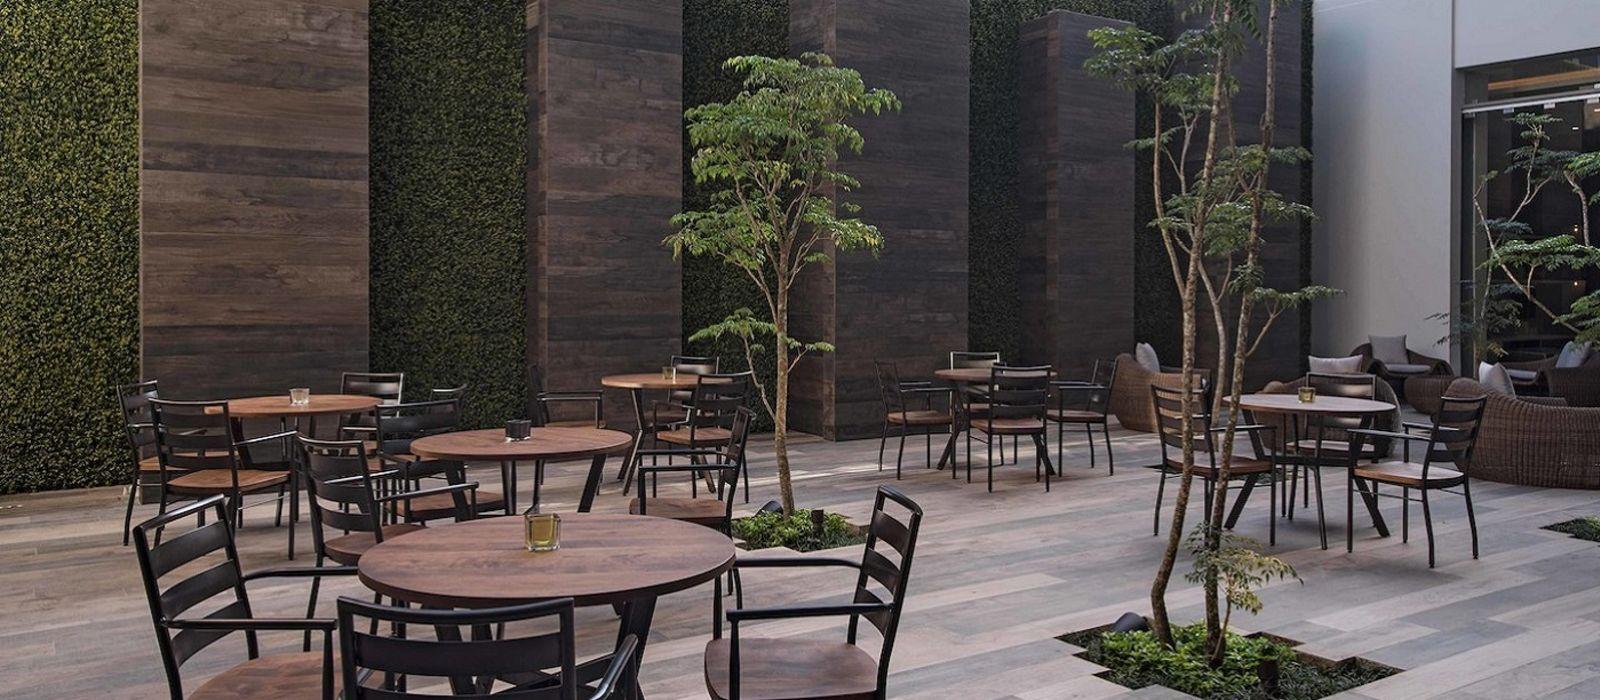 Hotel Courtyard by Marriott Guatemala City Guatemala